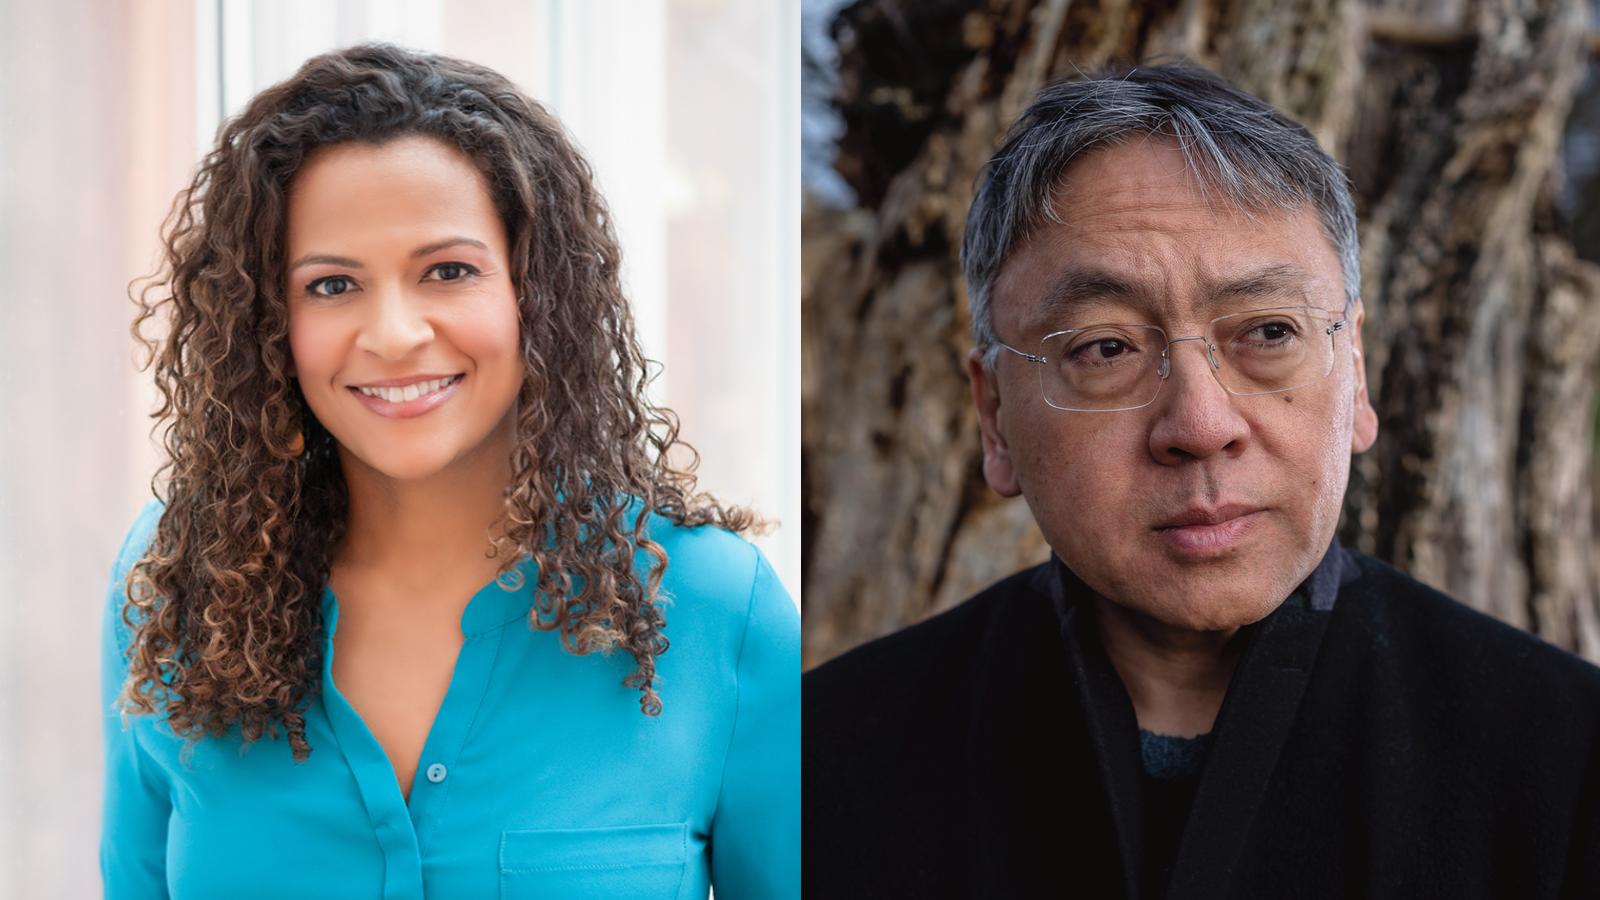 Alison Stewart and Kazuo Ishiguro